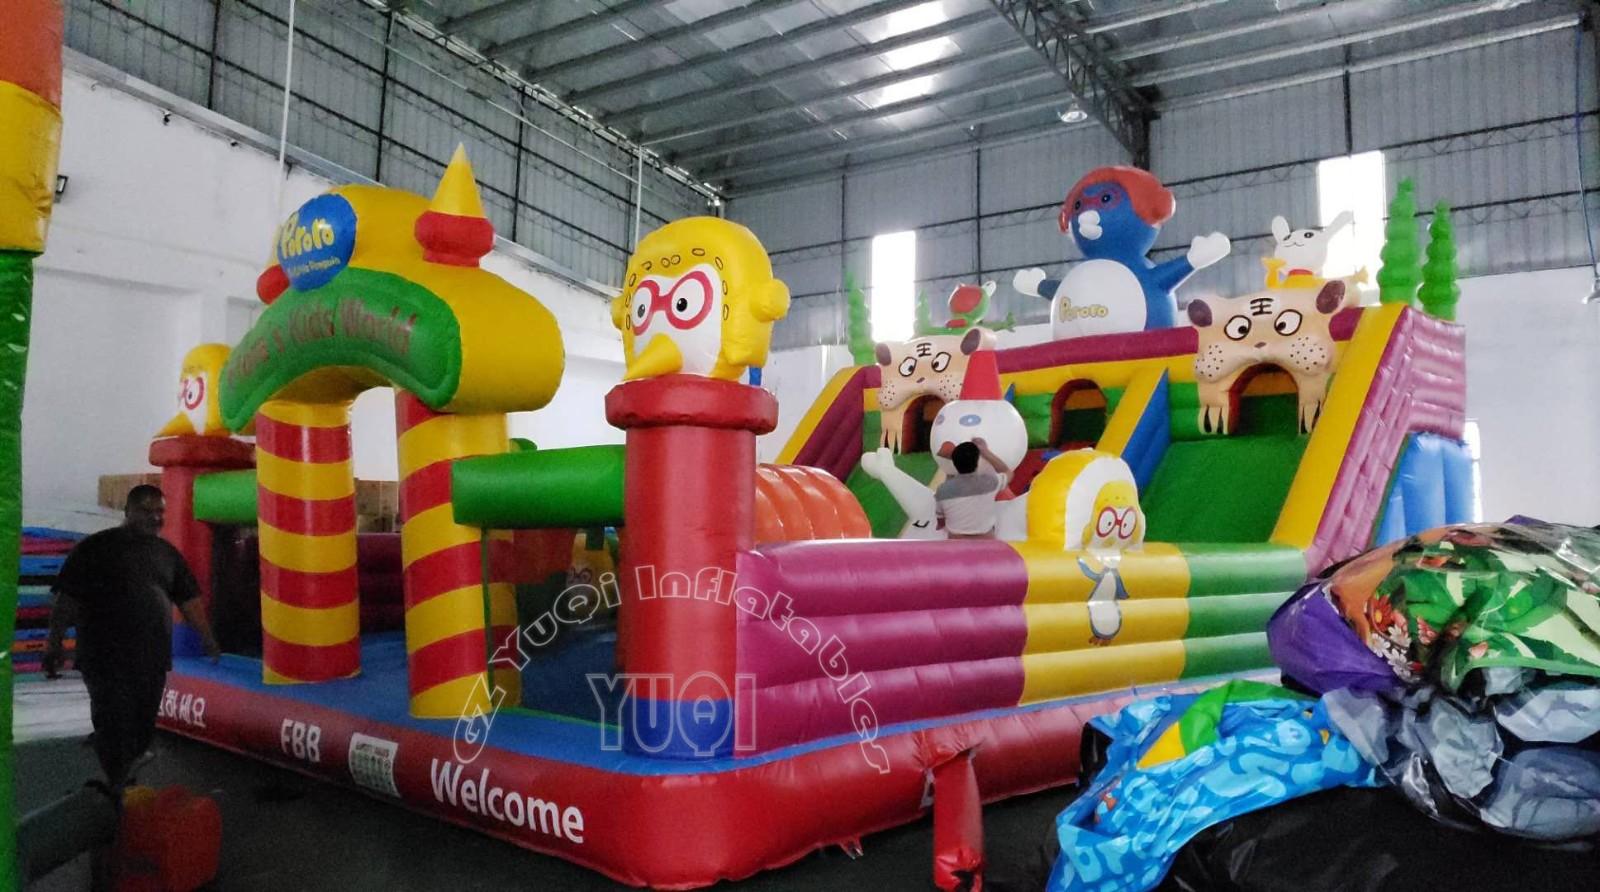 YUQI-Find Inflatable Theme Park Inflatable World Amusement Park